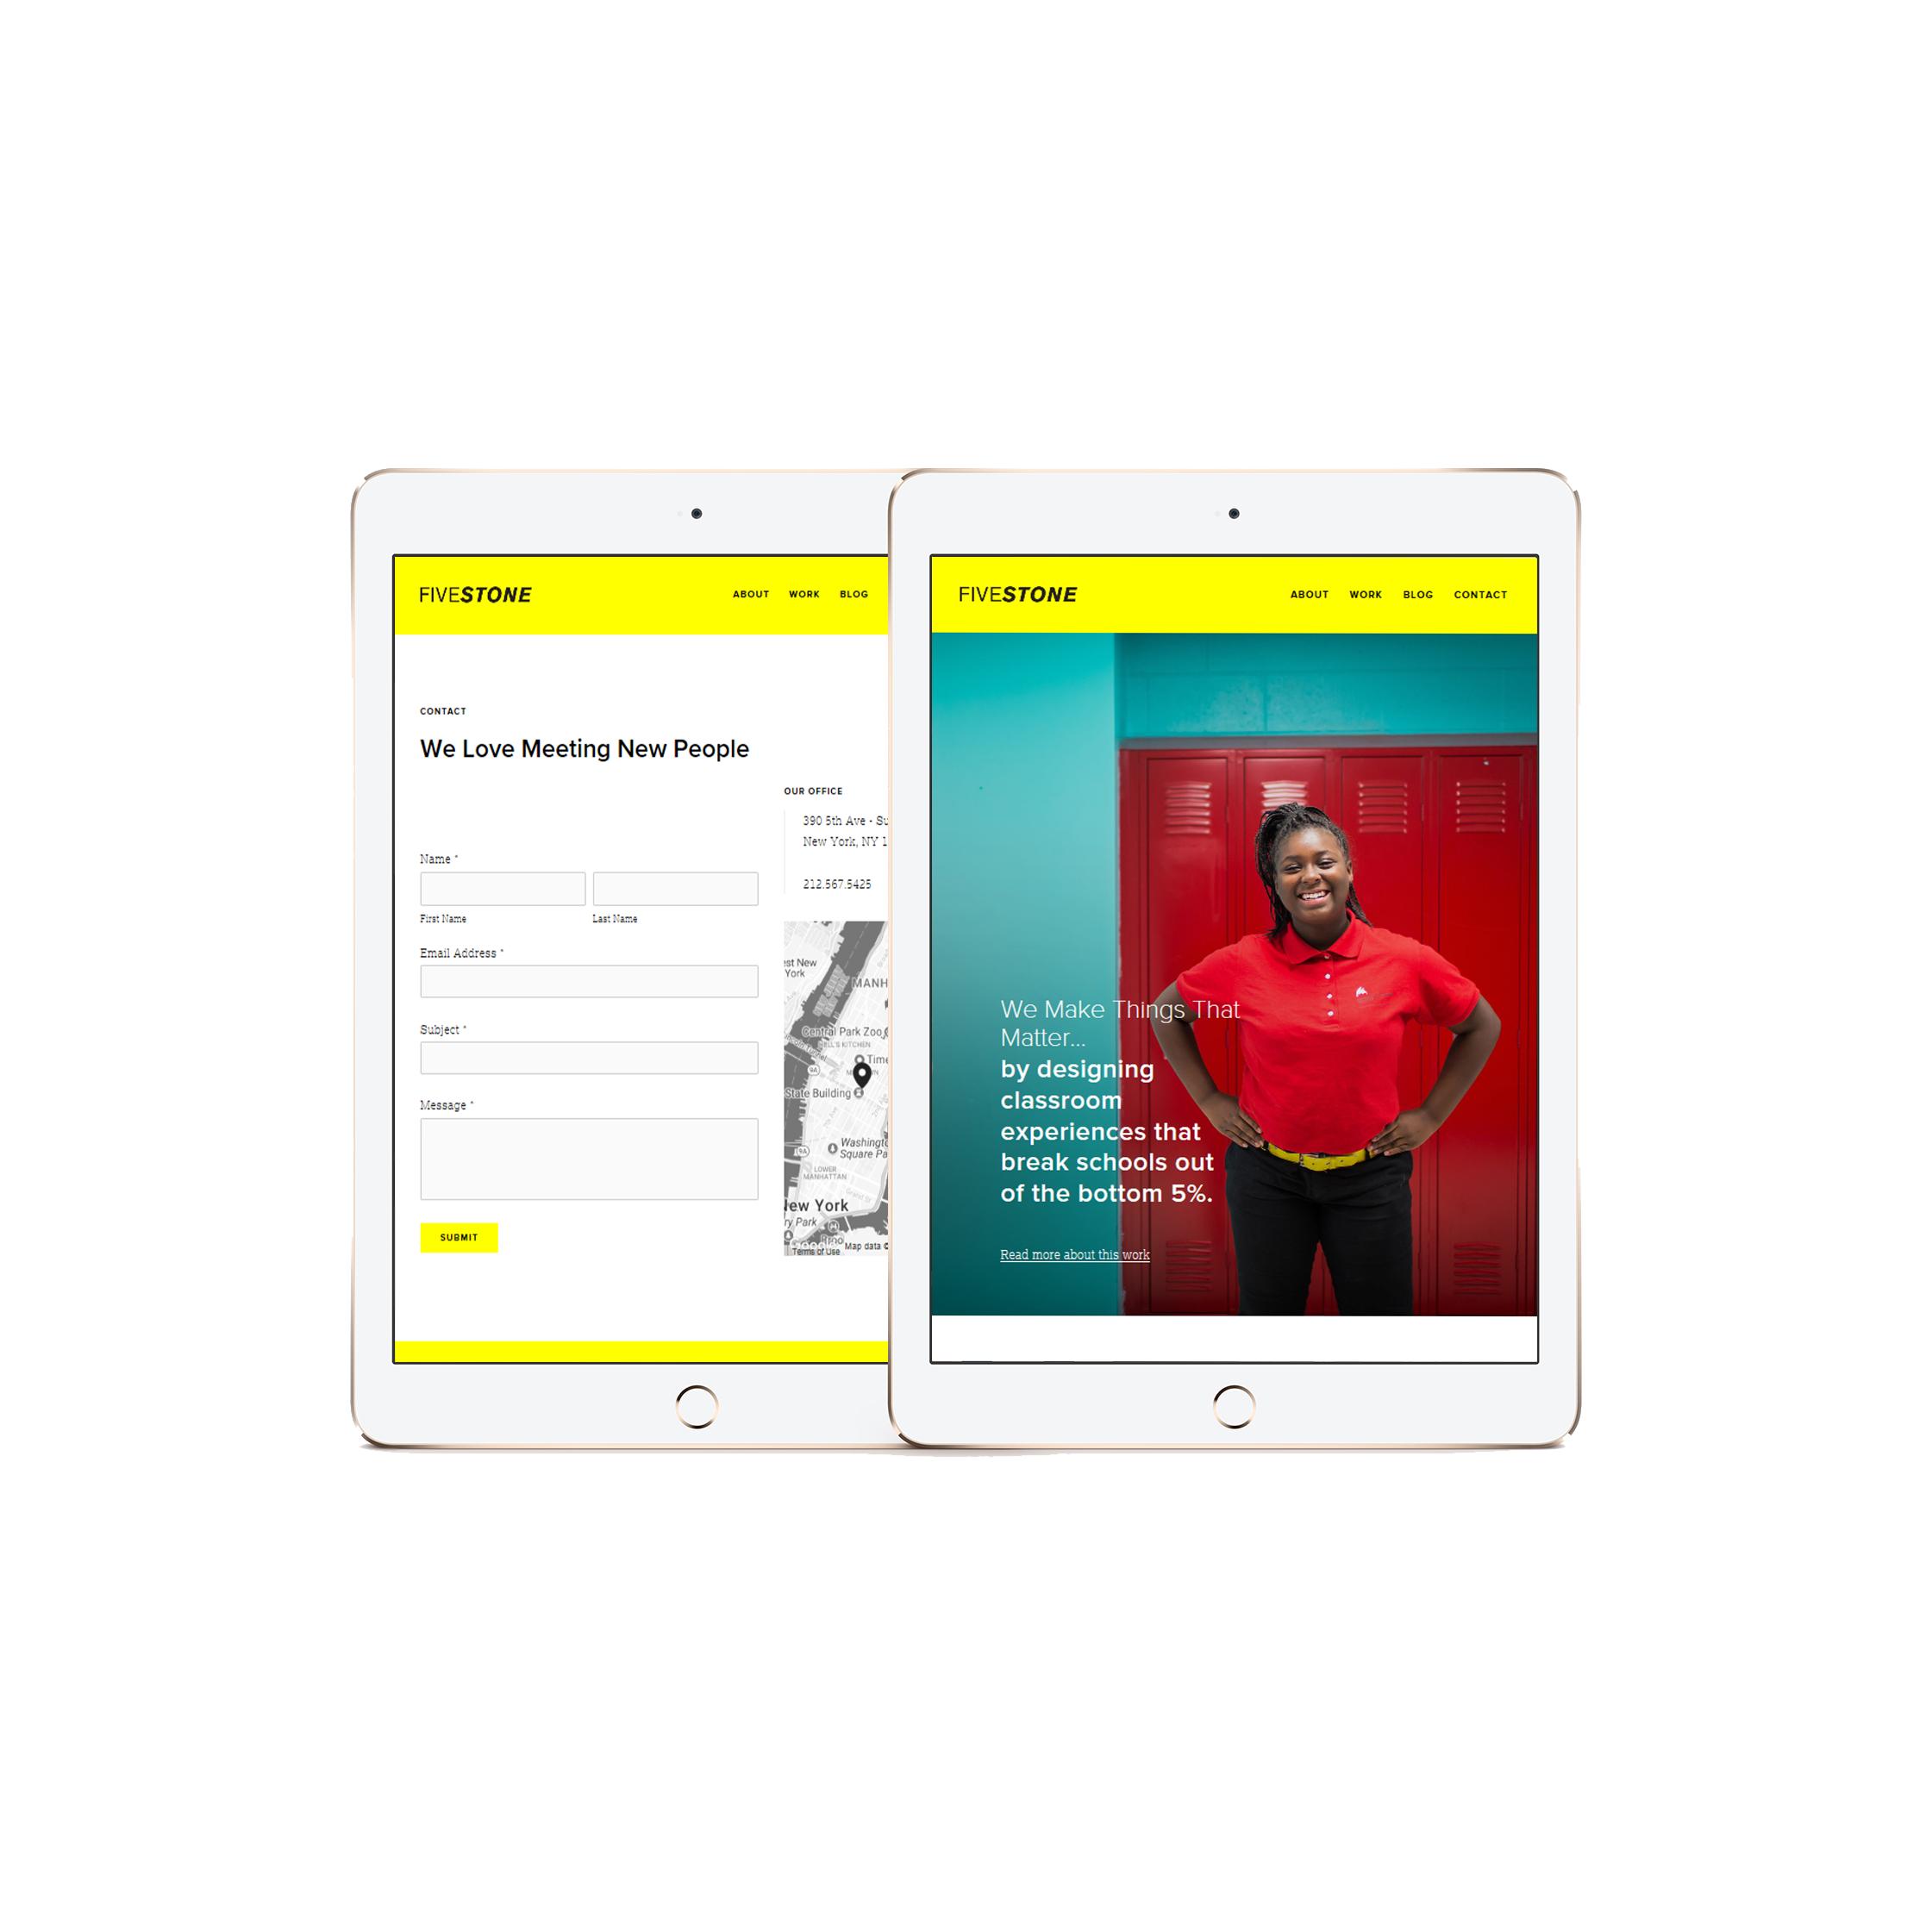 Fivestone-iPad.png